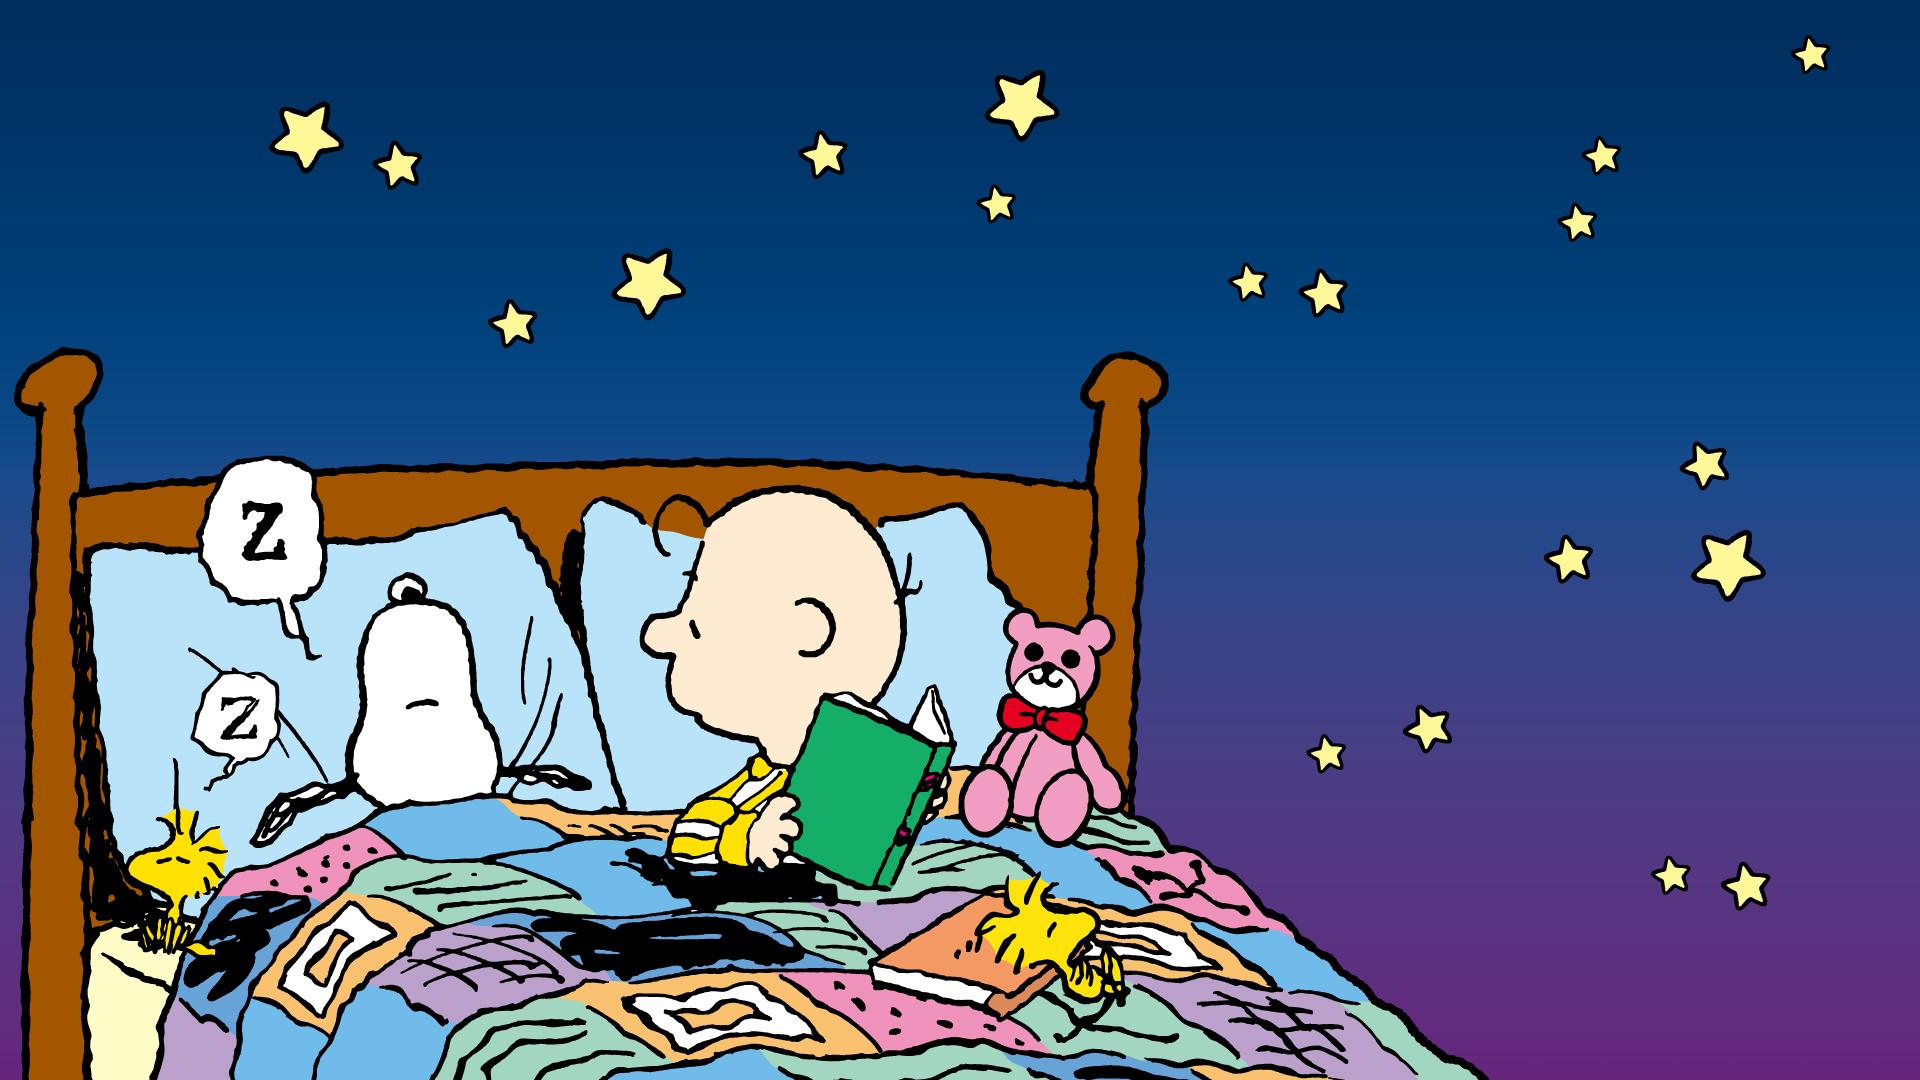 Snoopy-Charlie-Brown-Peanuts-Comic-Strip-1920x1080-wallpaper-wp34010799